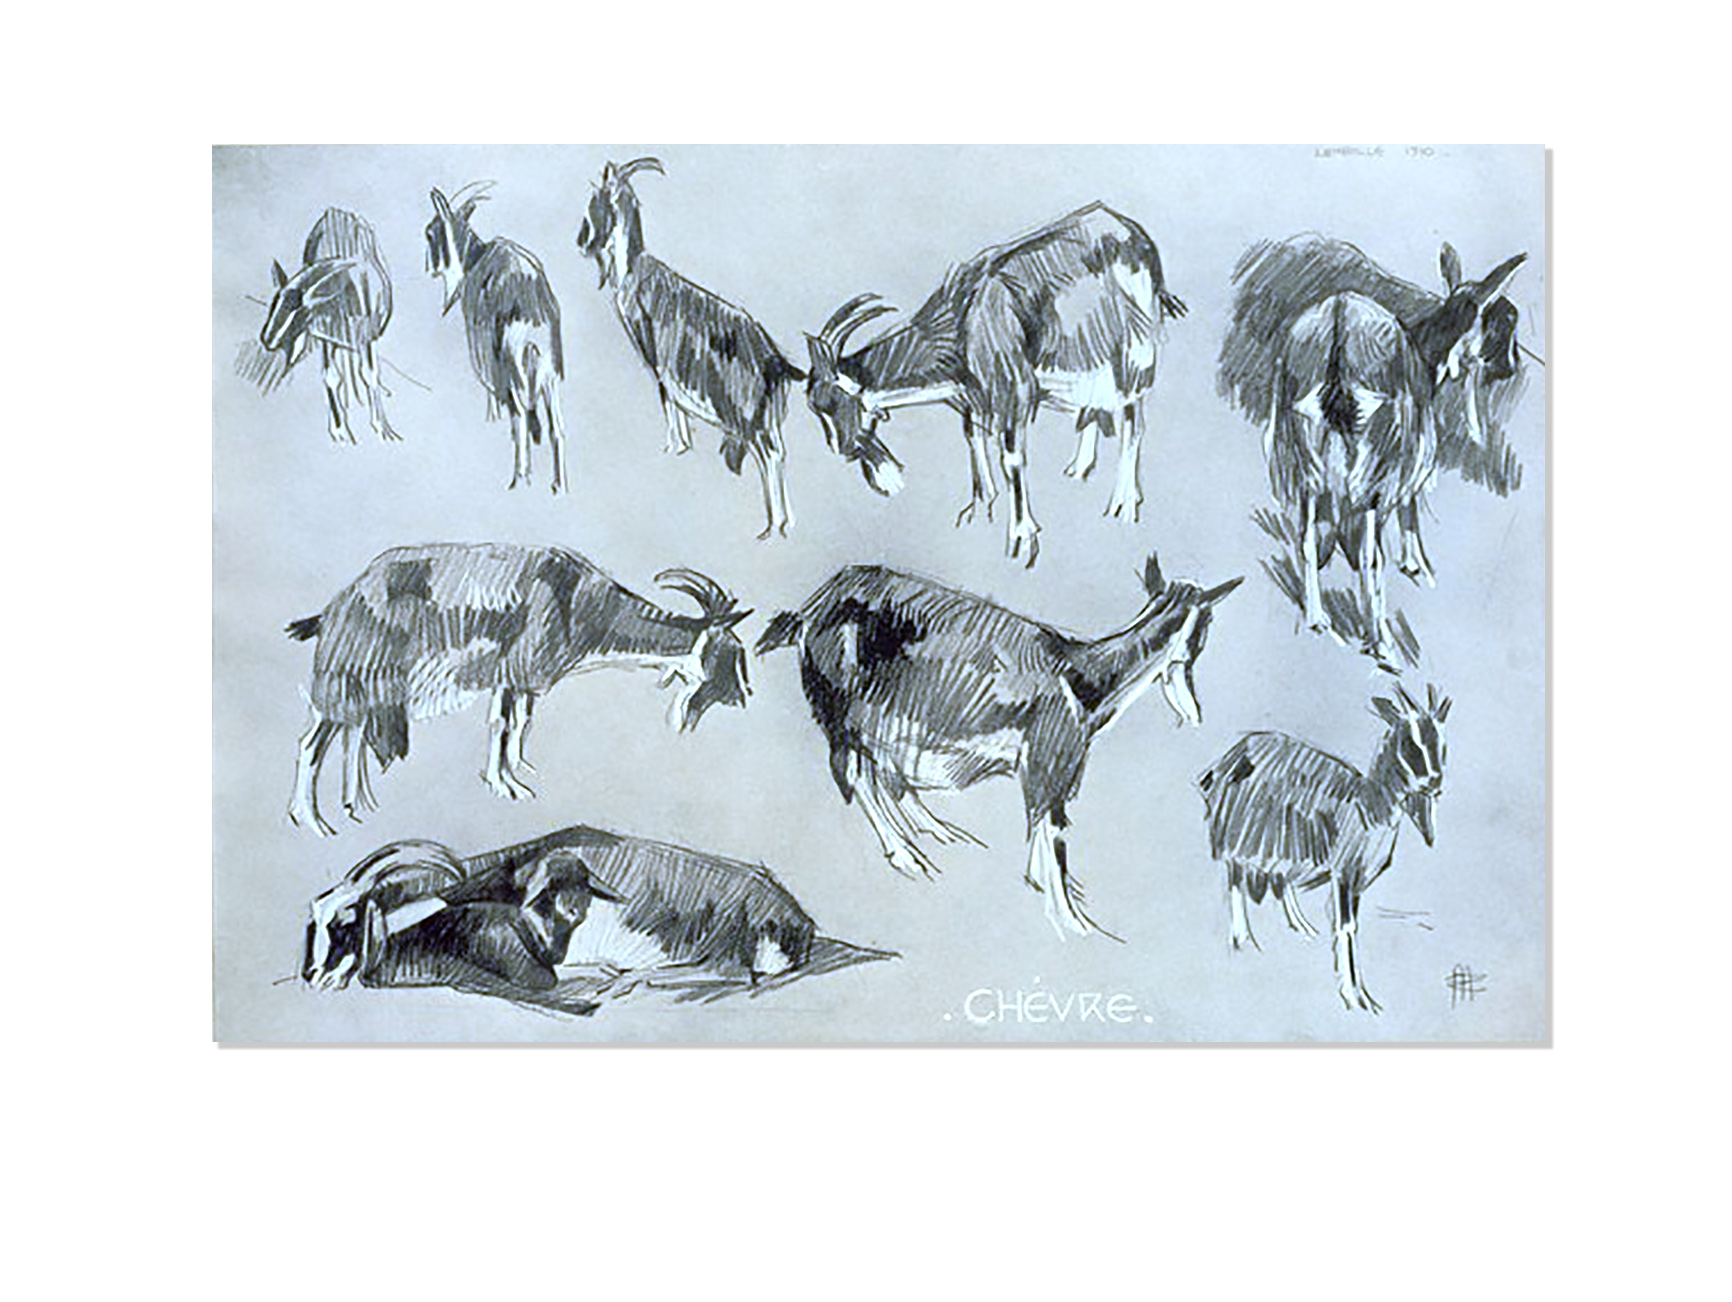 Chèvre - Études d'animaux, de Méheut, Mathurin, 1882-1958 (Artist) - The Digital Public Library of America-NYPL catalog ID (B-number): b13983745